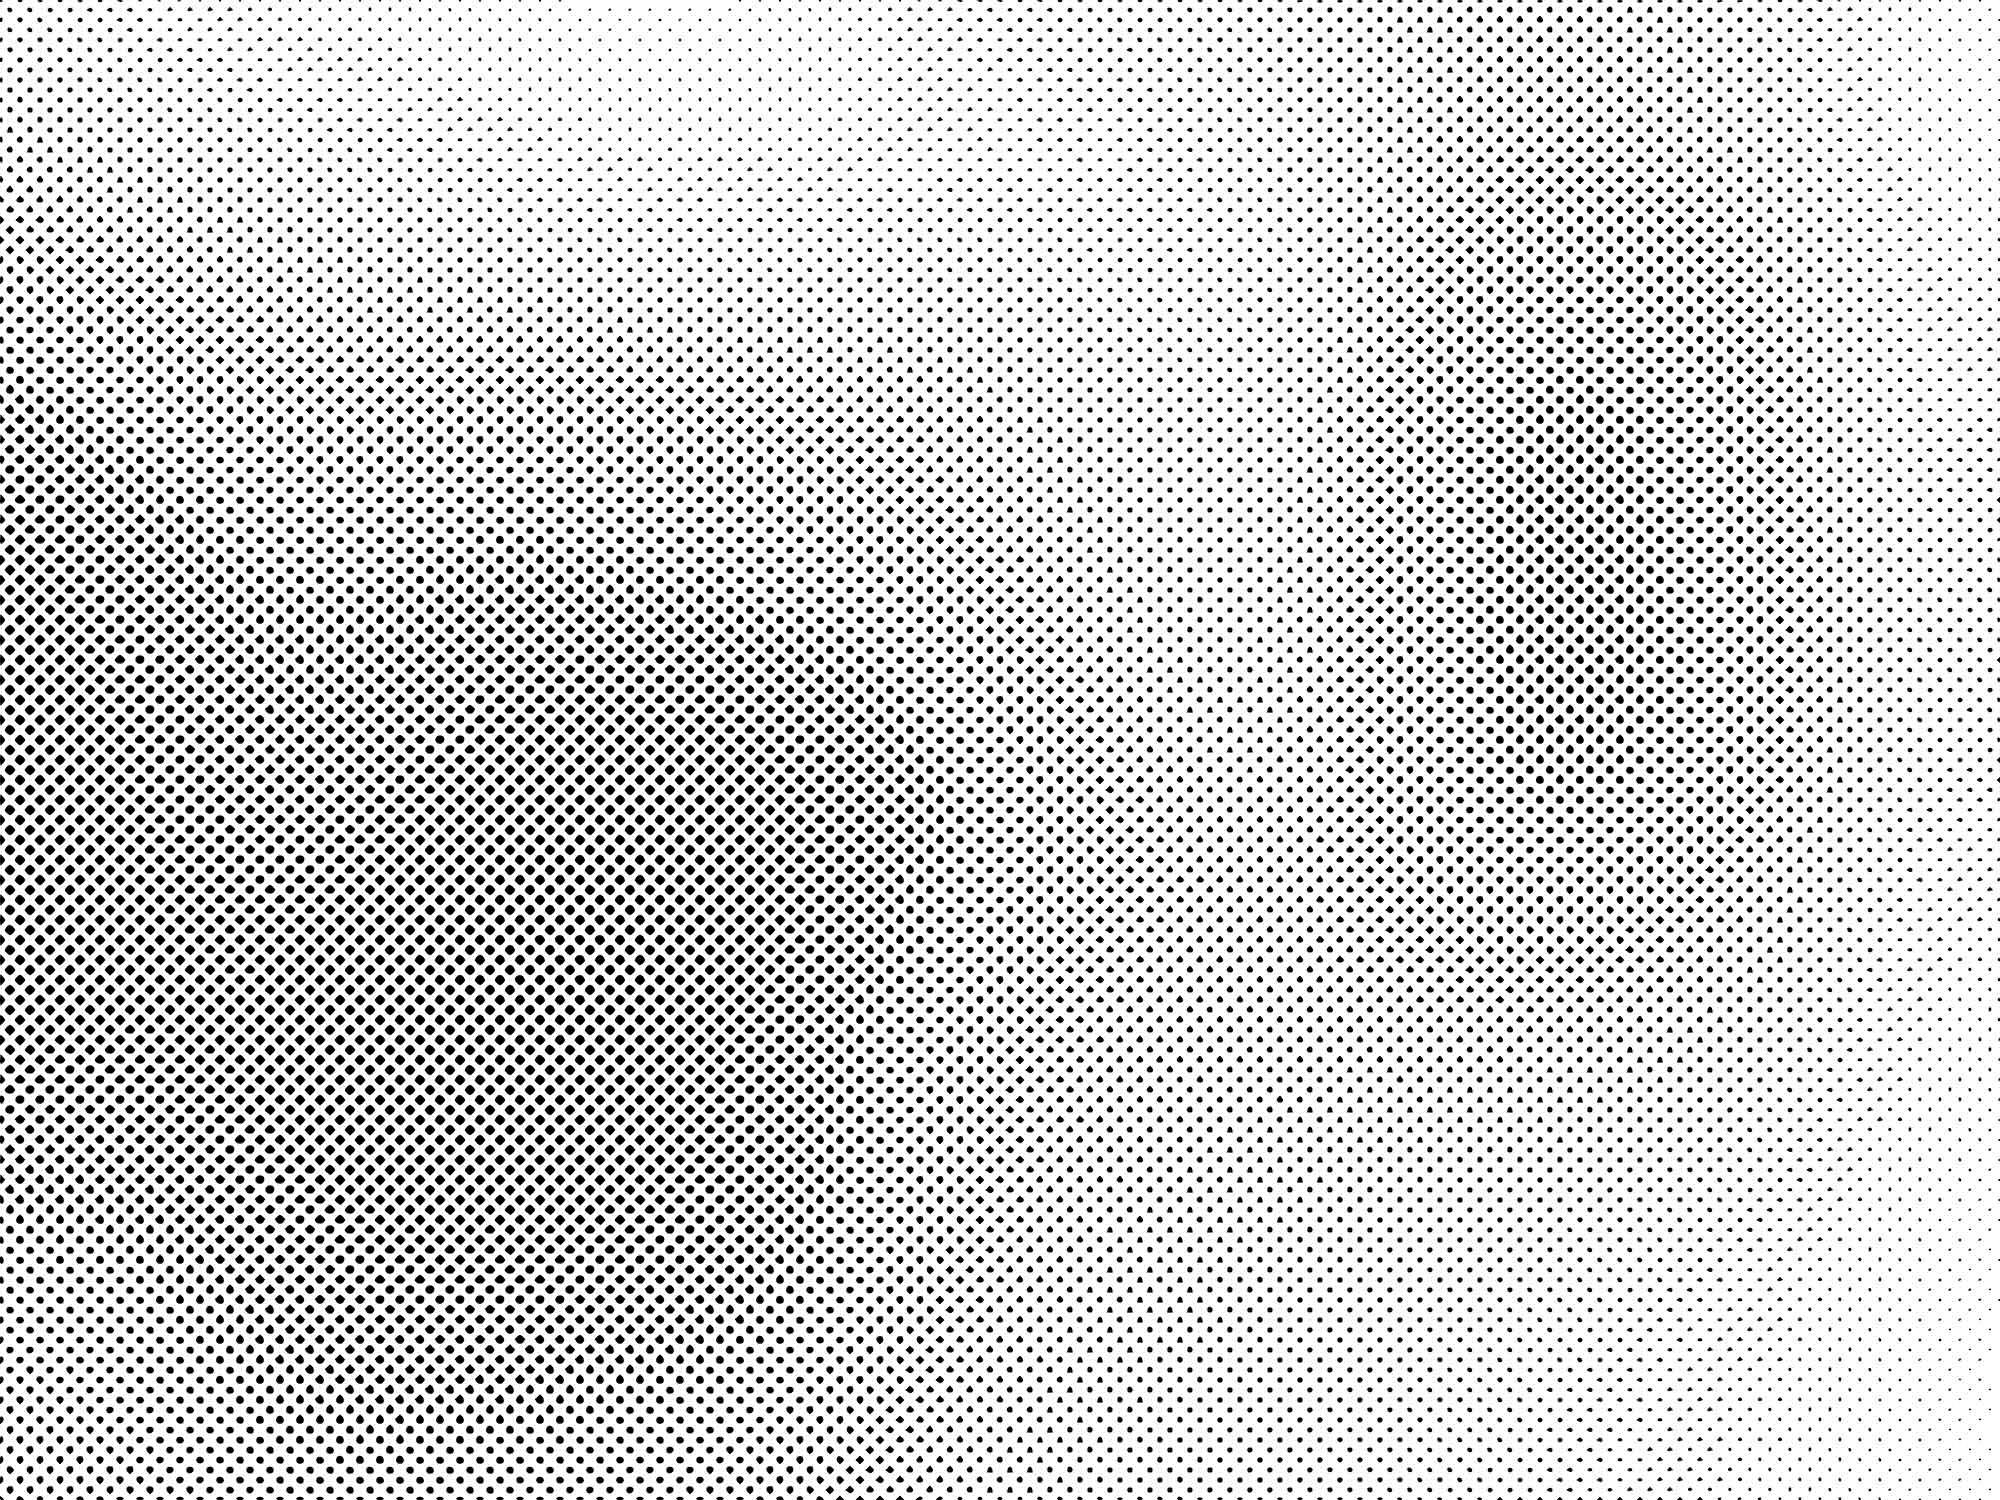 Halftone Dot Textures 6